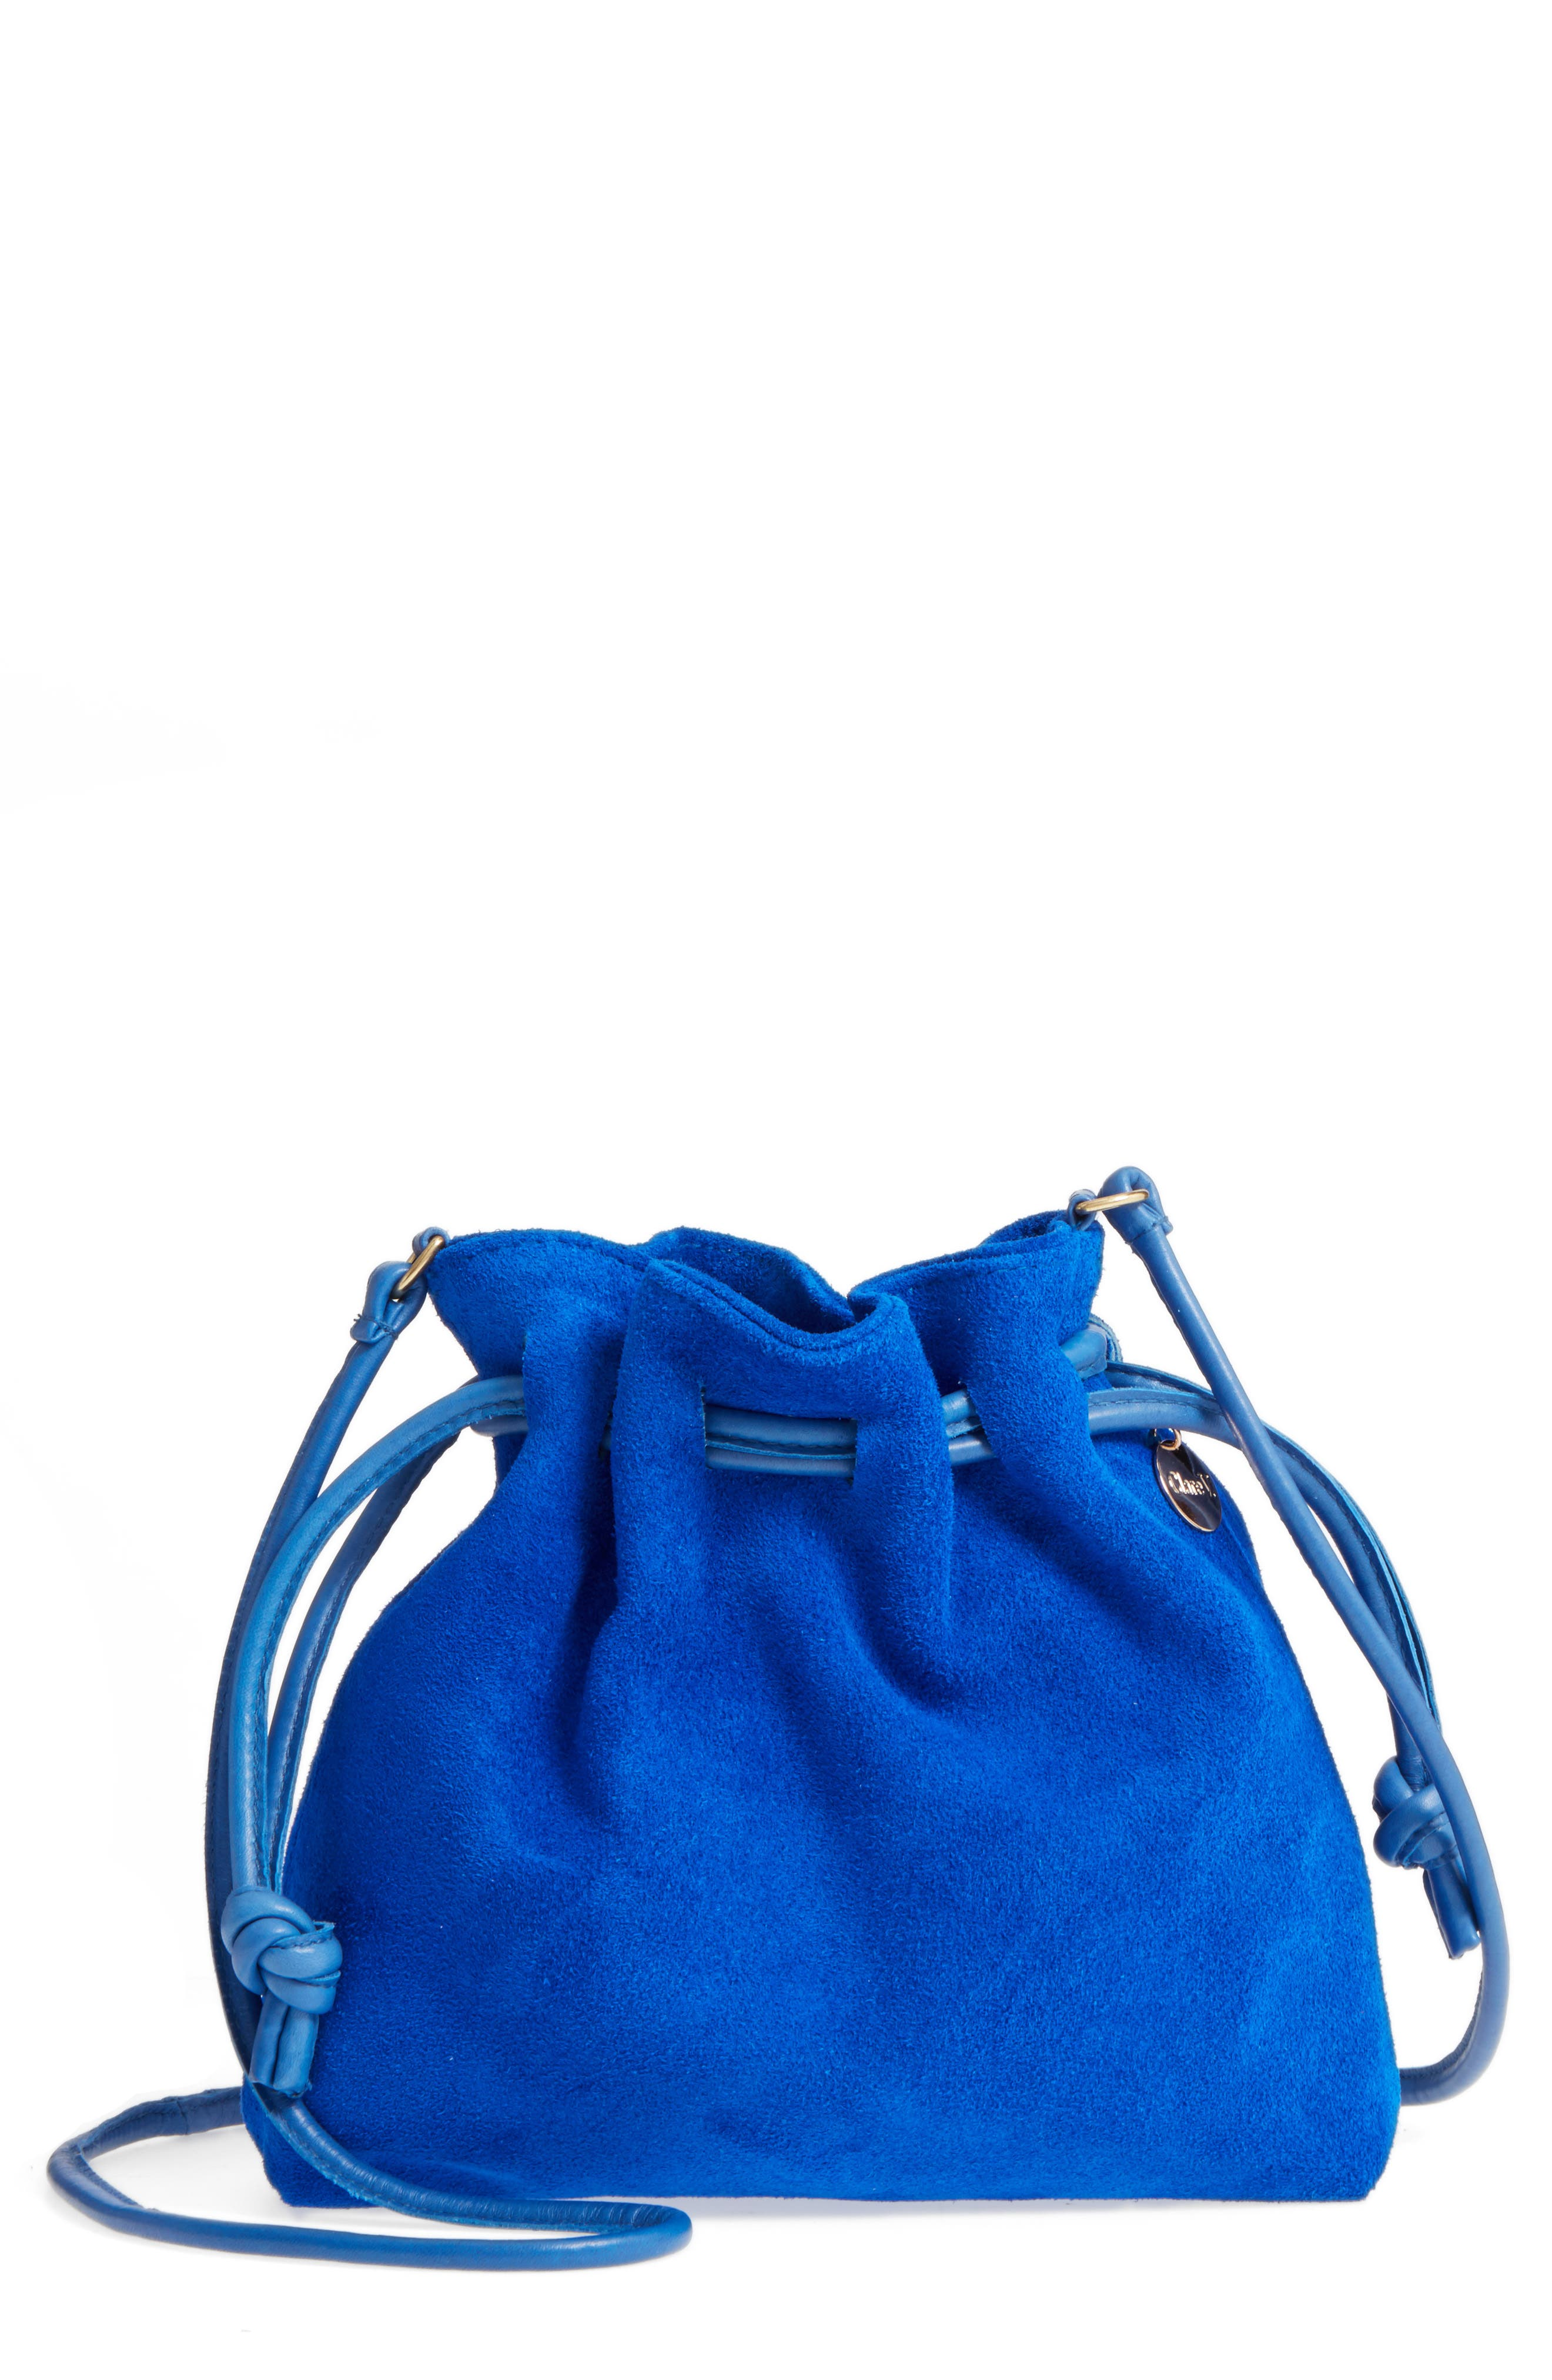 Clare V. Petite Henri Suede Bucket Bag